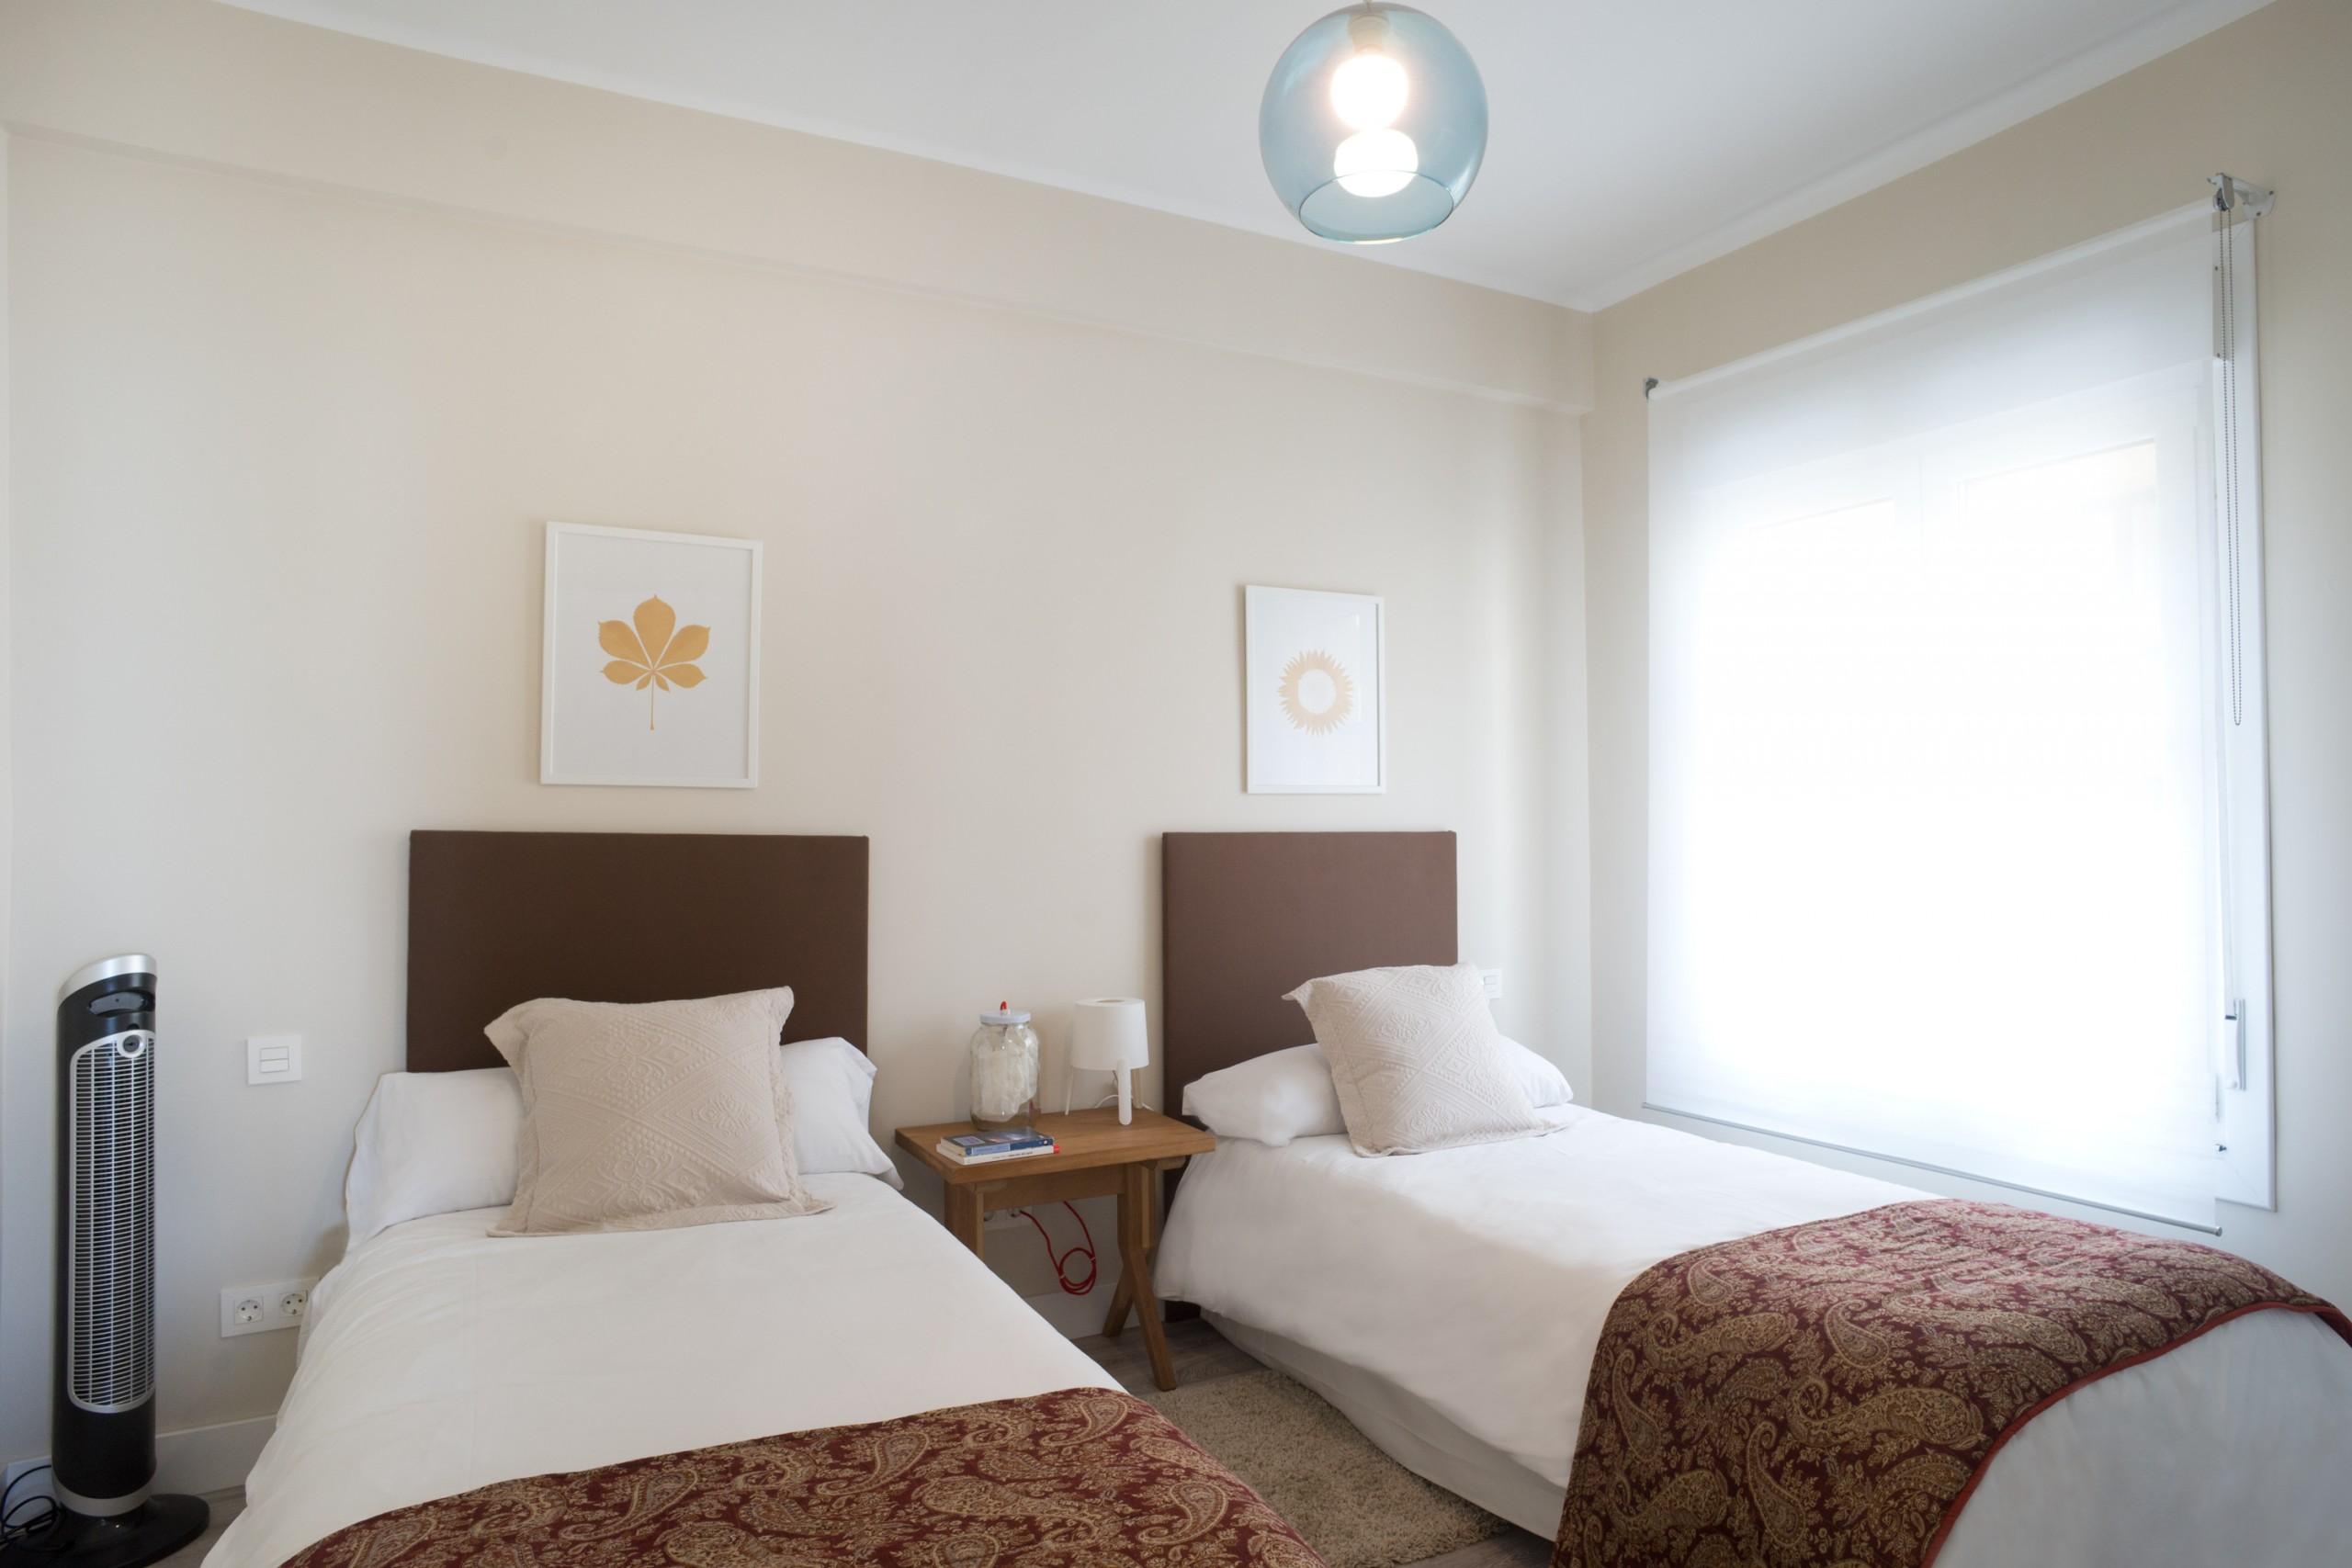 100 2 Bedroom Apartments San Diego June 2016